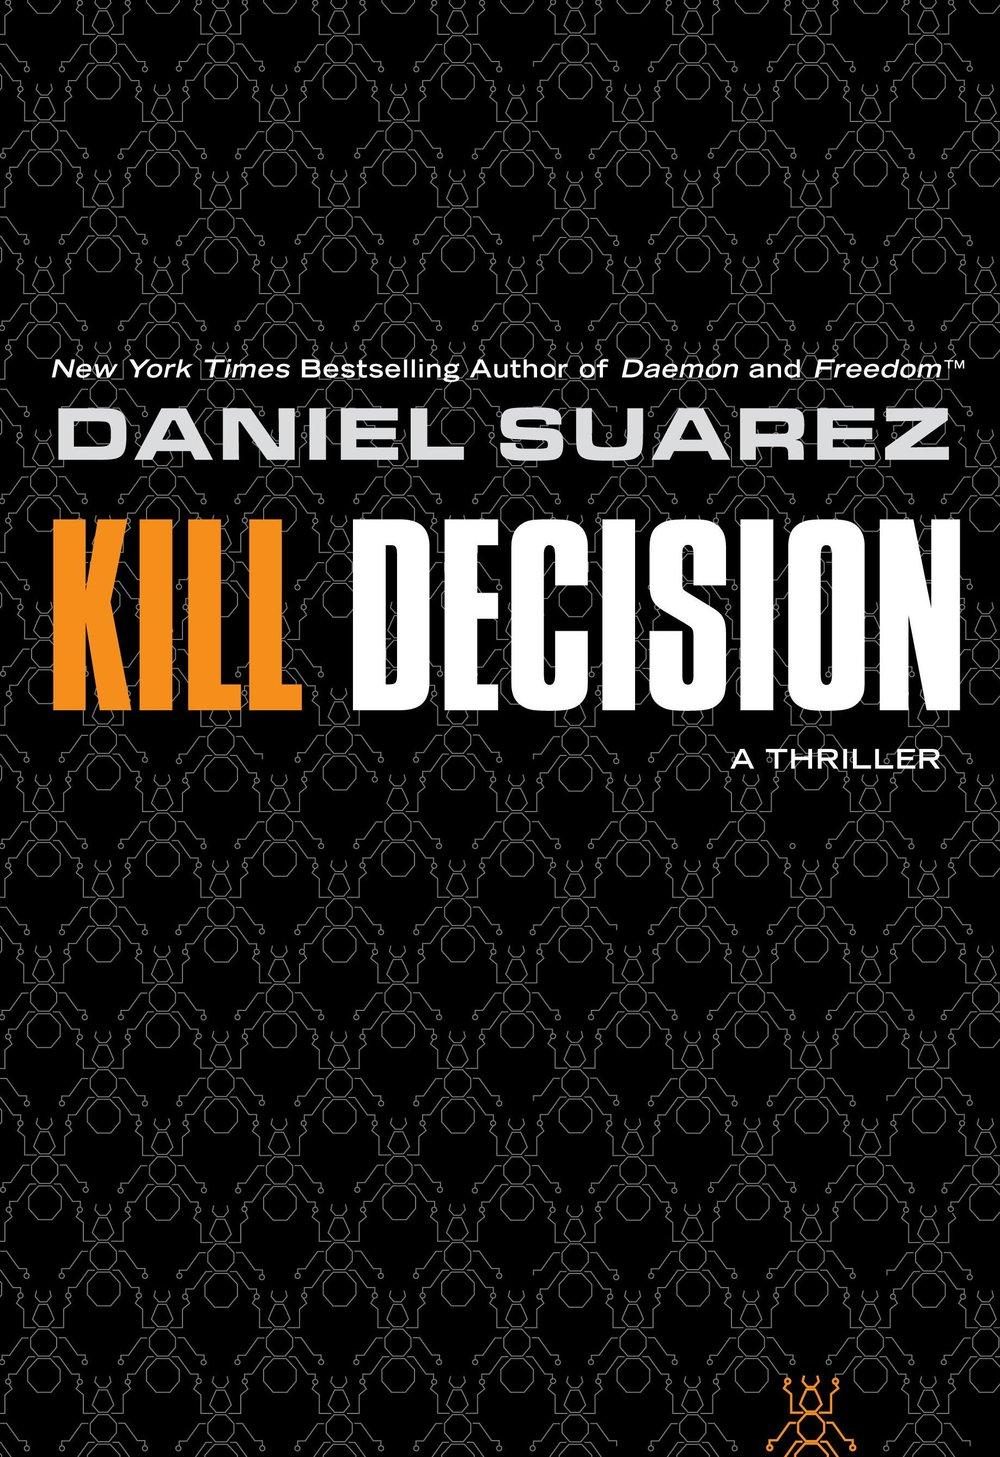 Kill-Decision.jpg